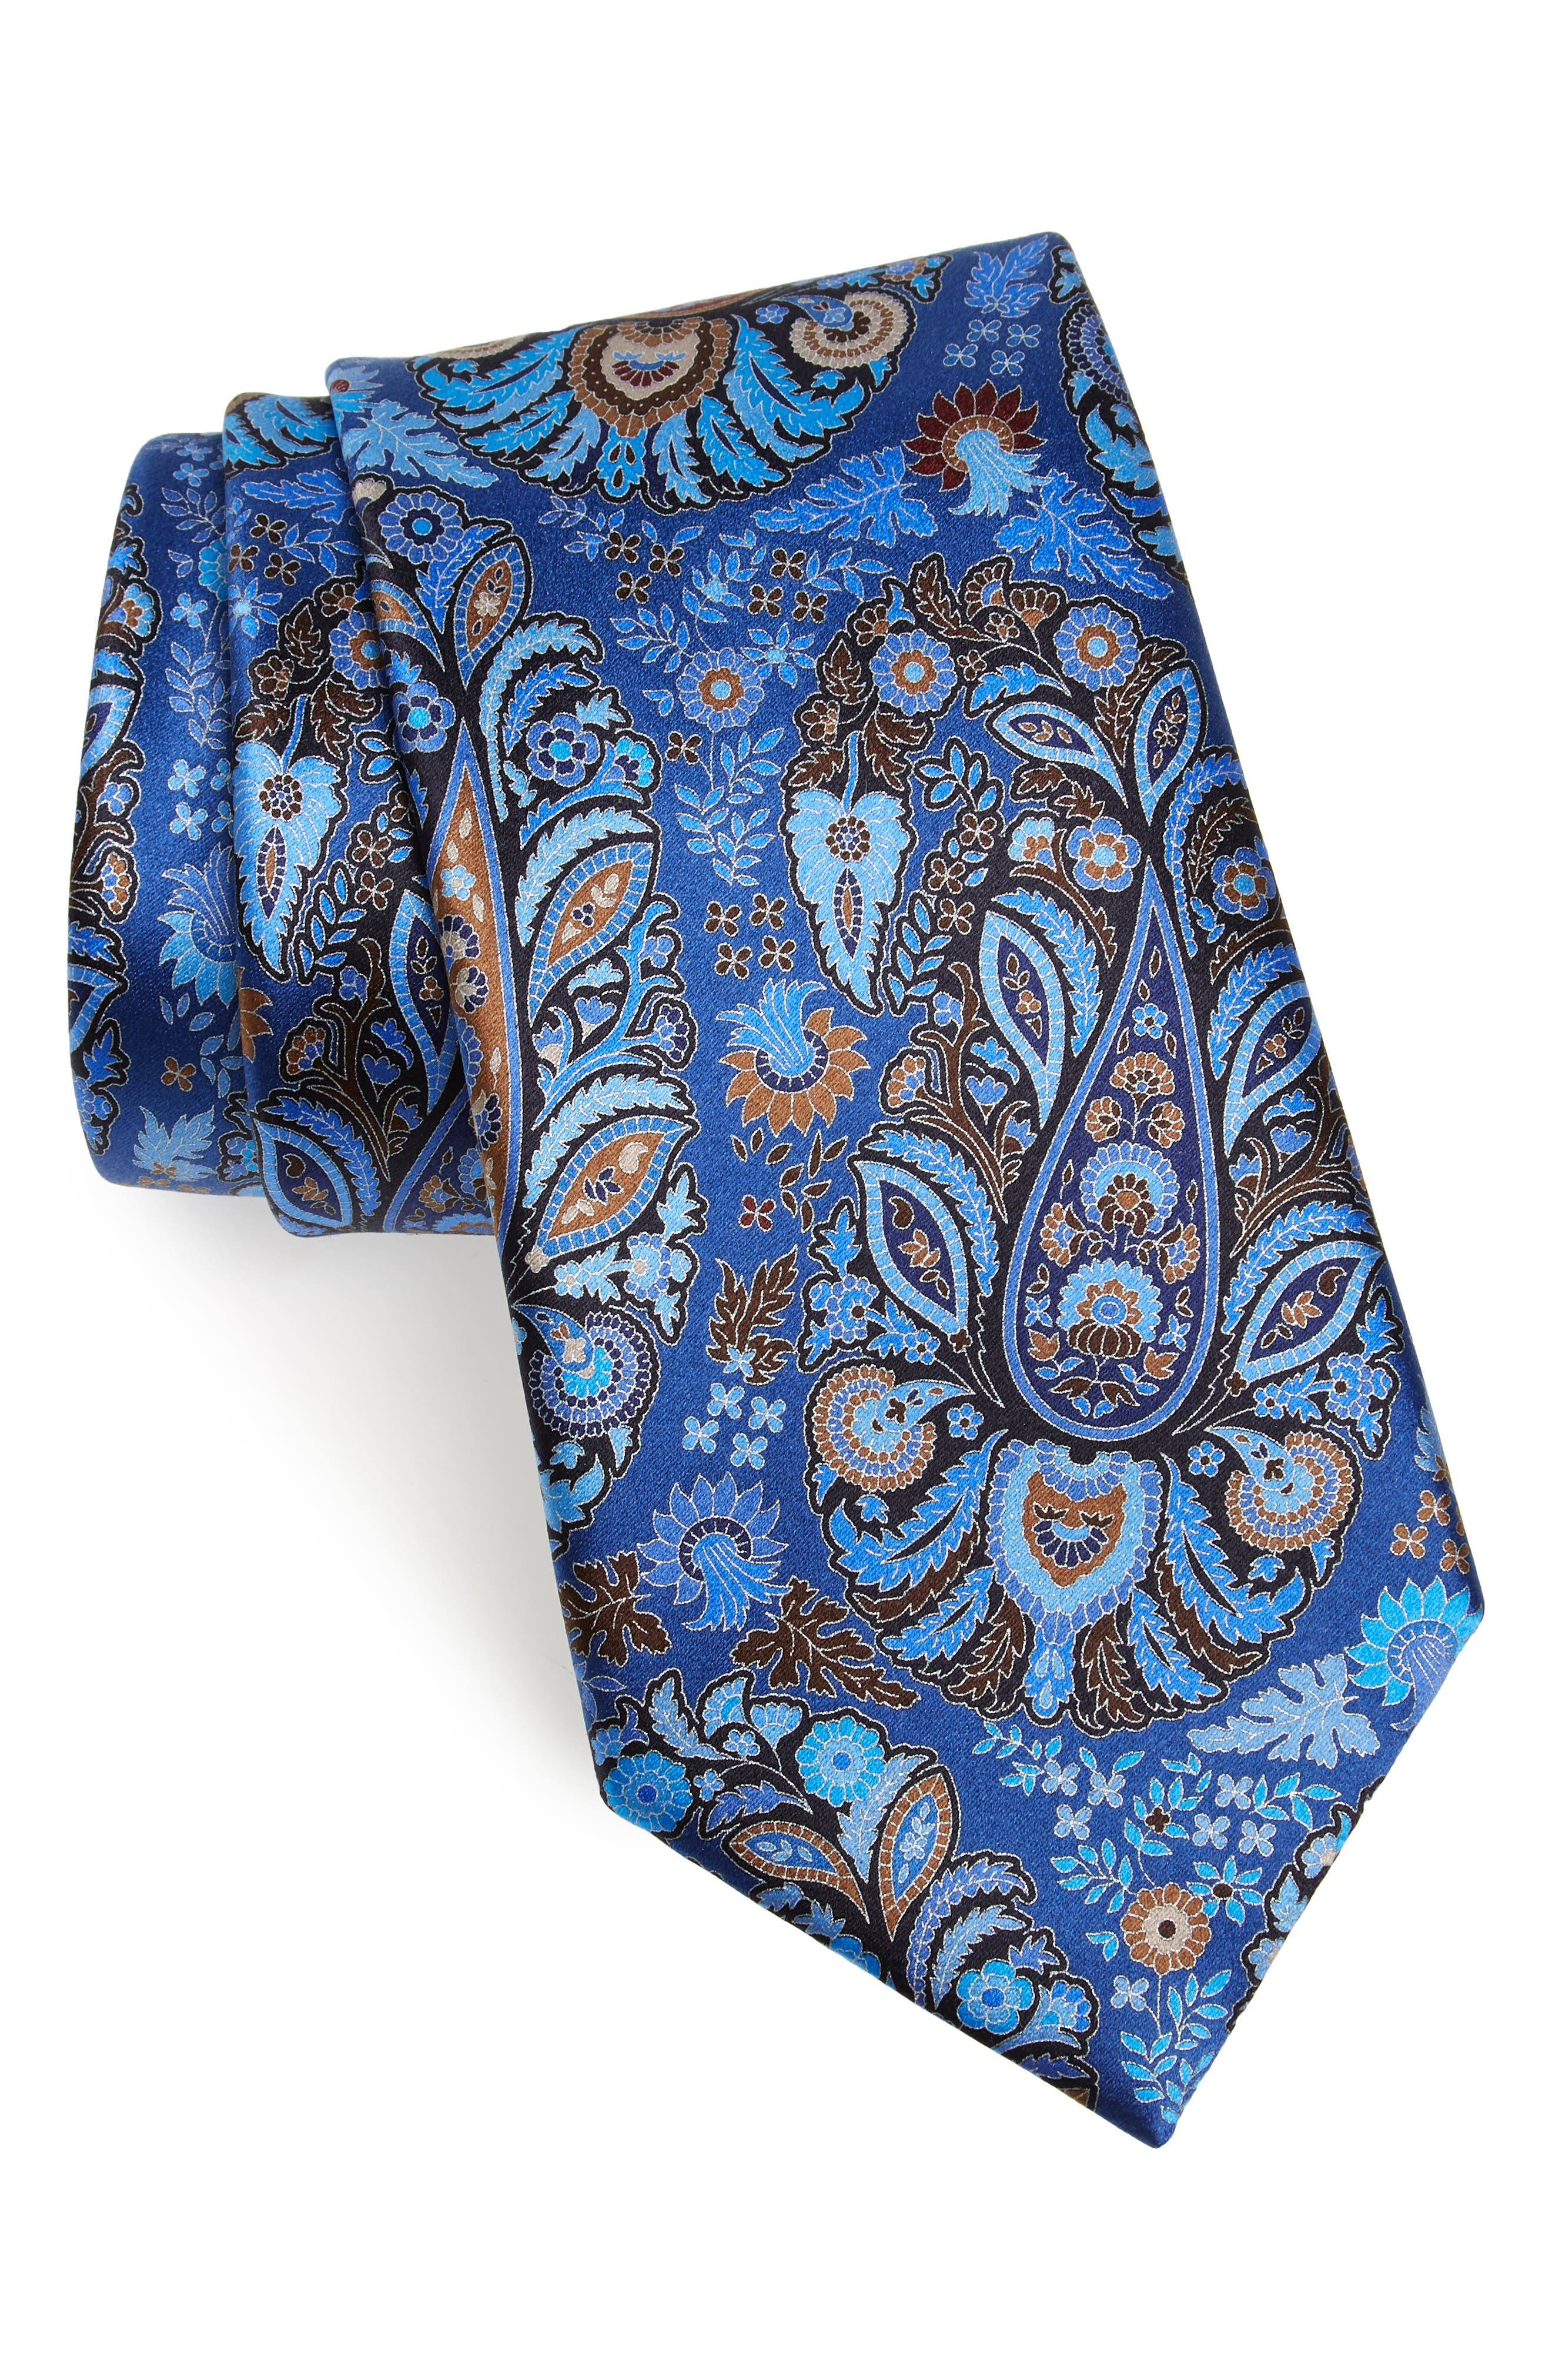 ERMENEGILDO ZEGNA, Quindici Paisley Silk Tie, Main thumbnail 1, color, BLUE